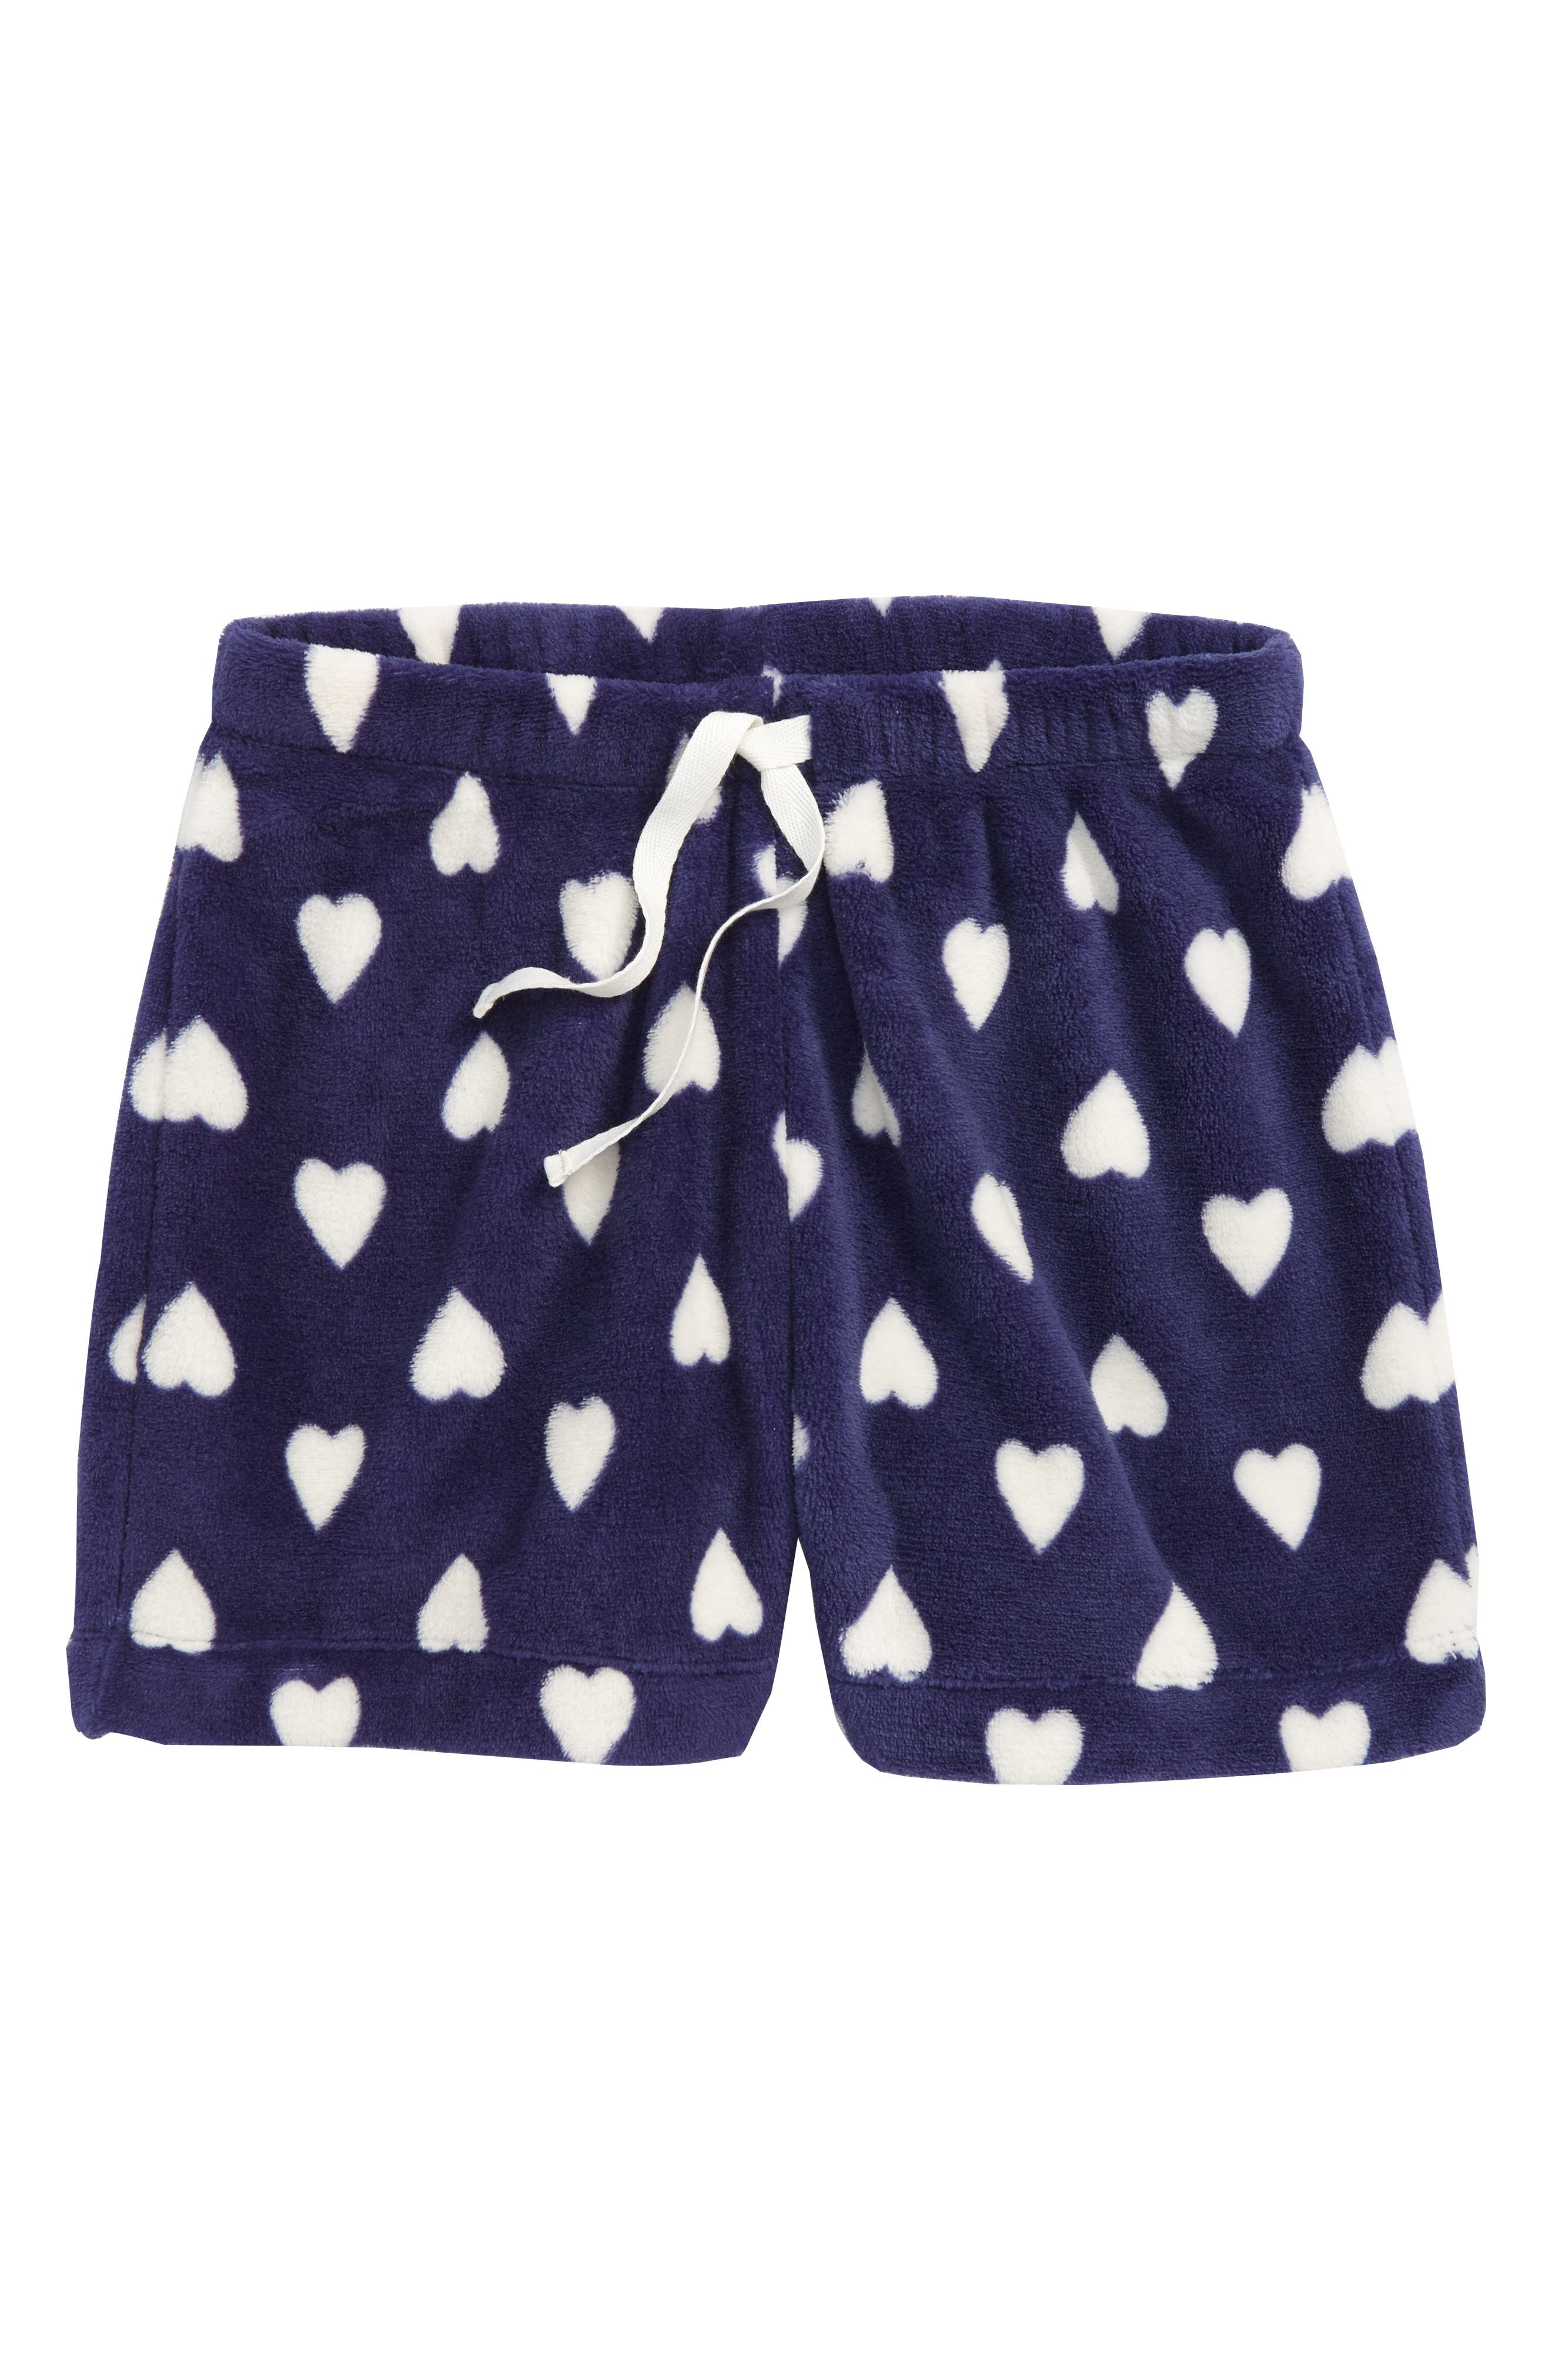 Fleece Sleep Shorts,                         Main,                         color, 410